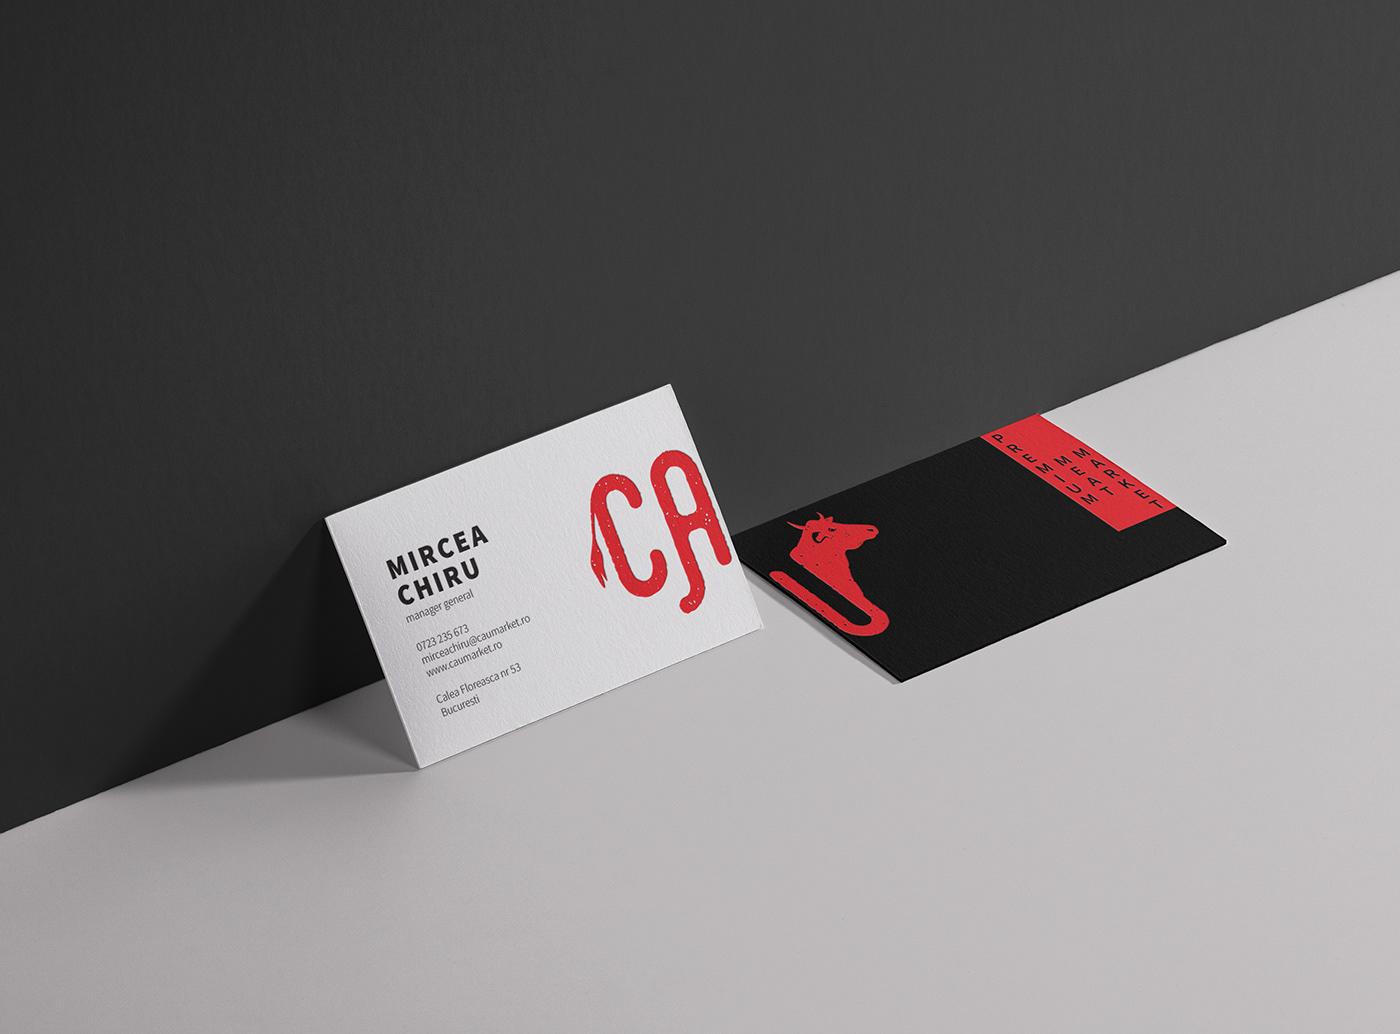 Image may contain: logo, businesscard and screenshot